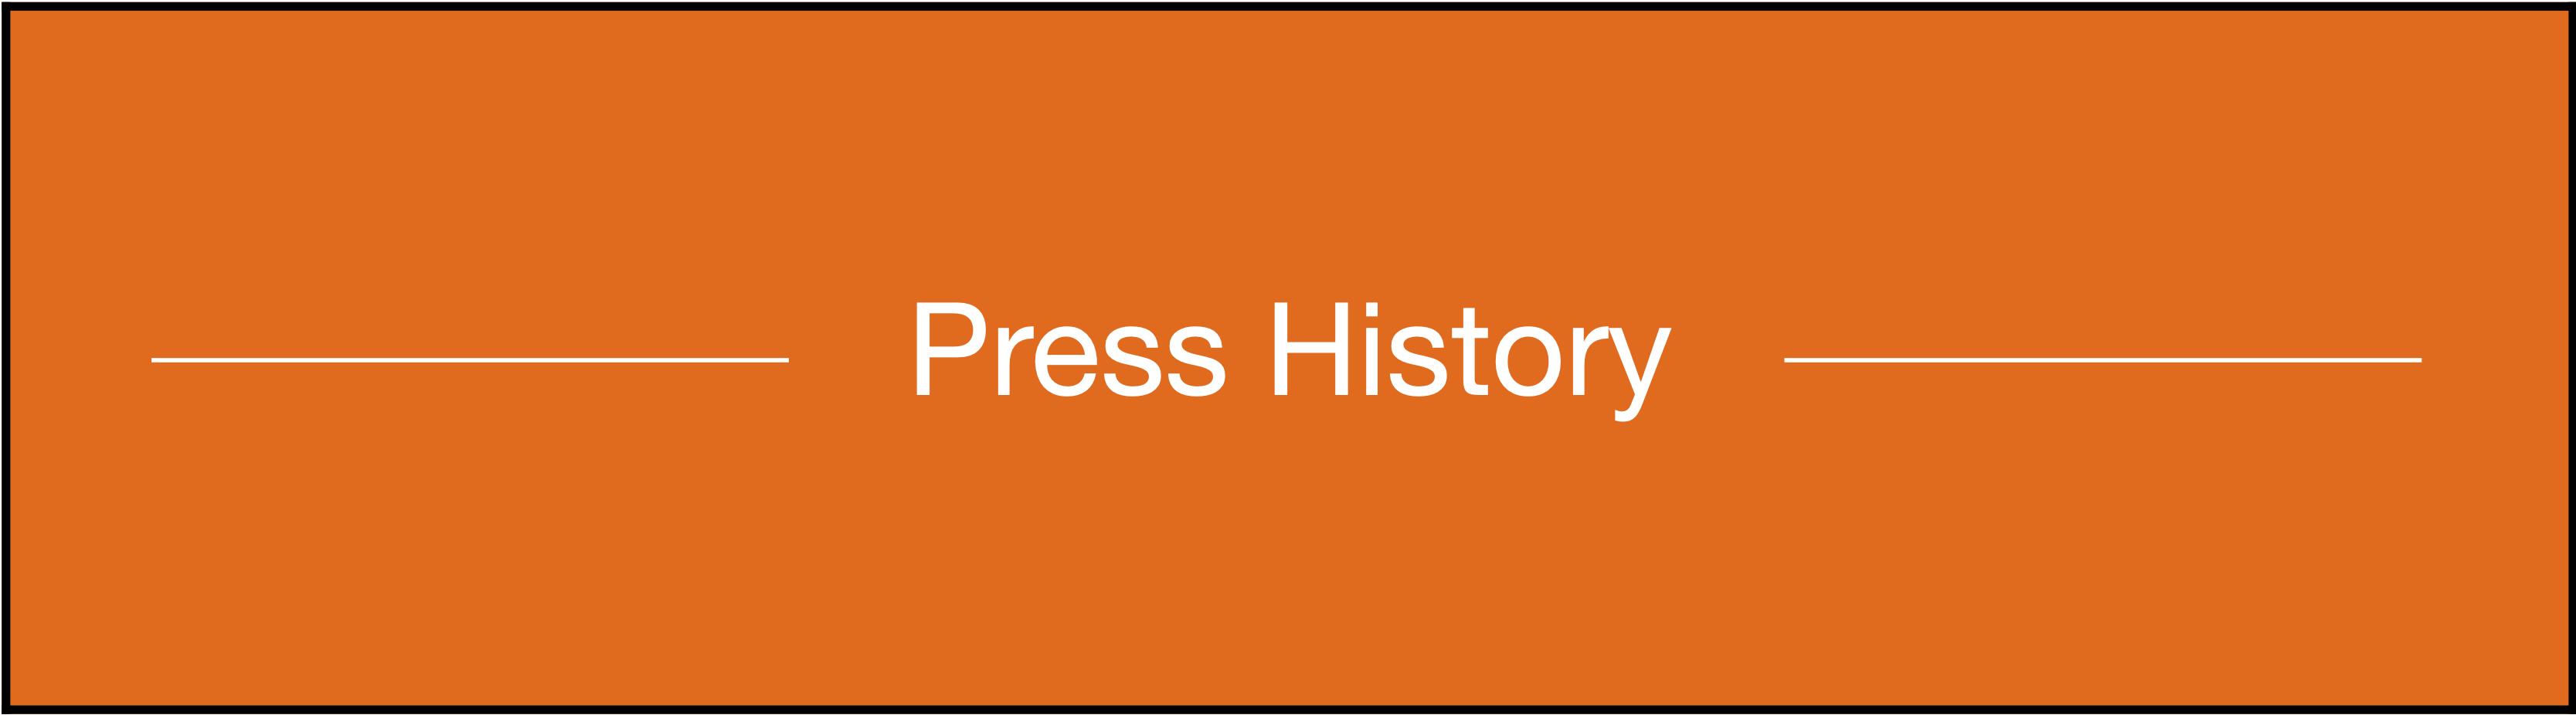 press-history.jpg